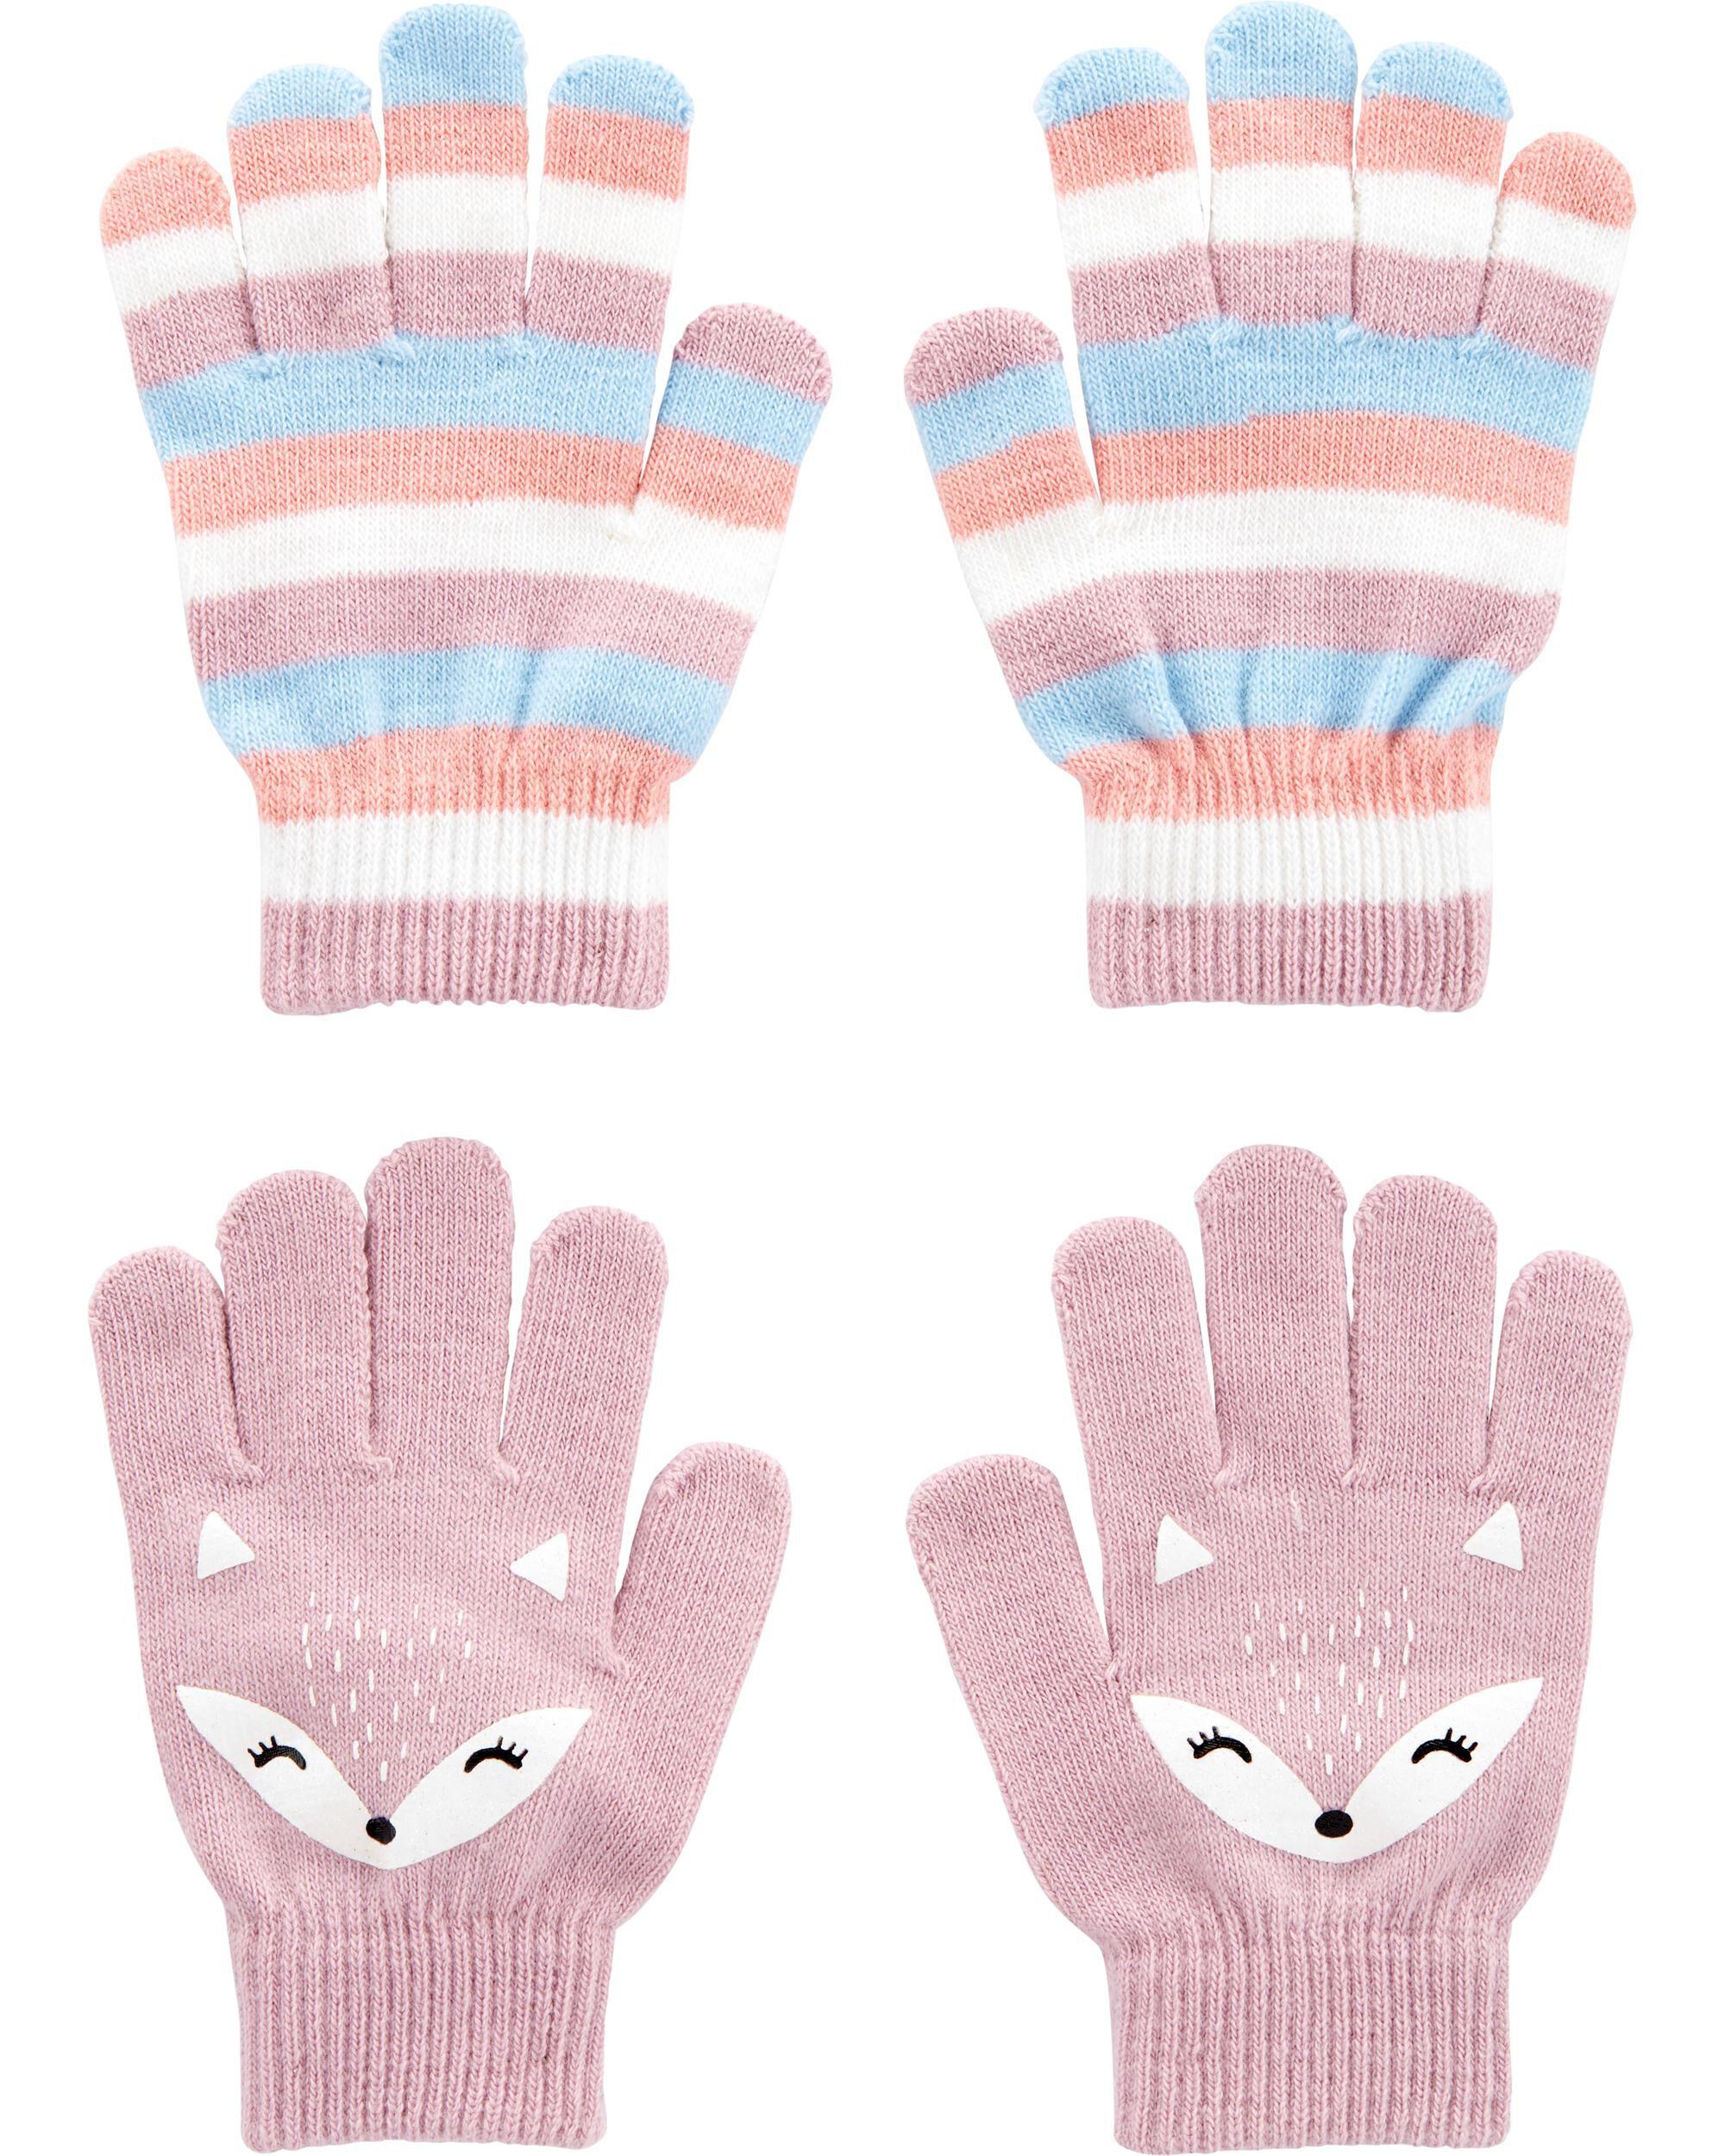 2-Pack Gripper Gloves